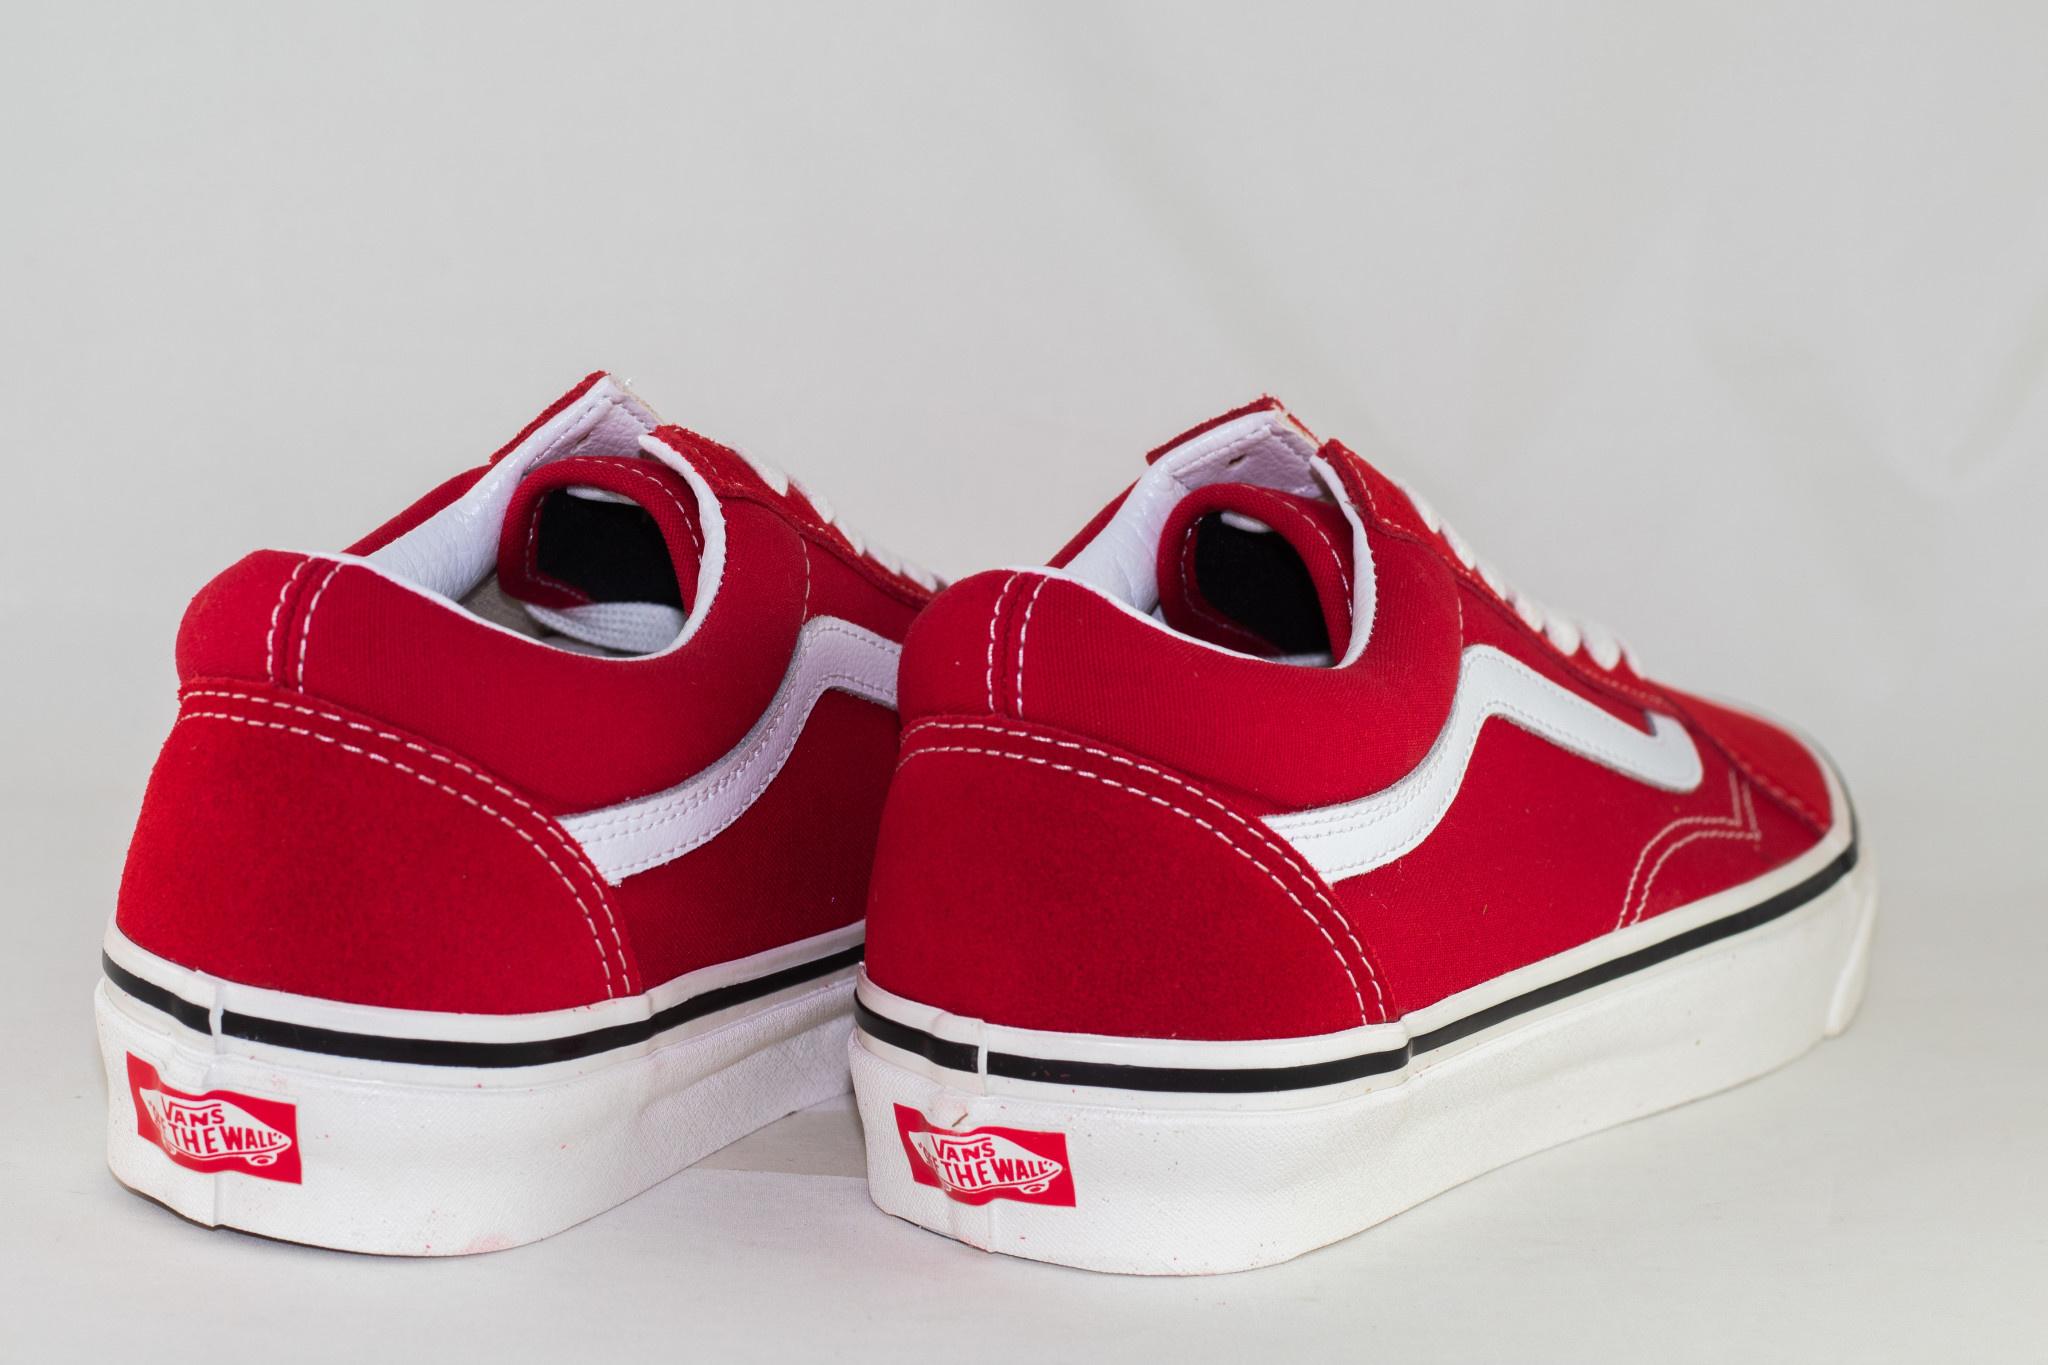 VANS OLD SKOOL 36 DX (Anaheim Factory) Og Red/ Og White